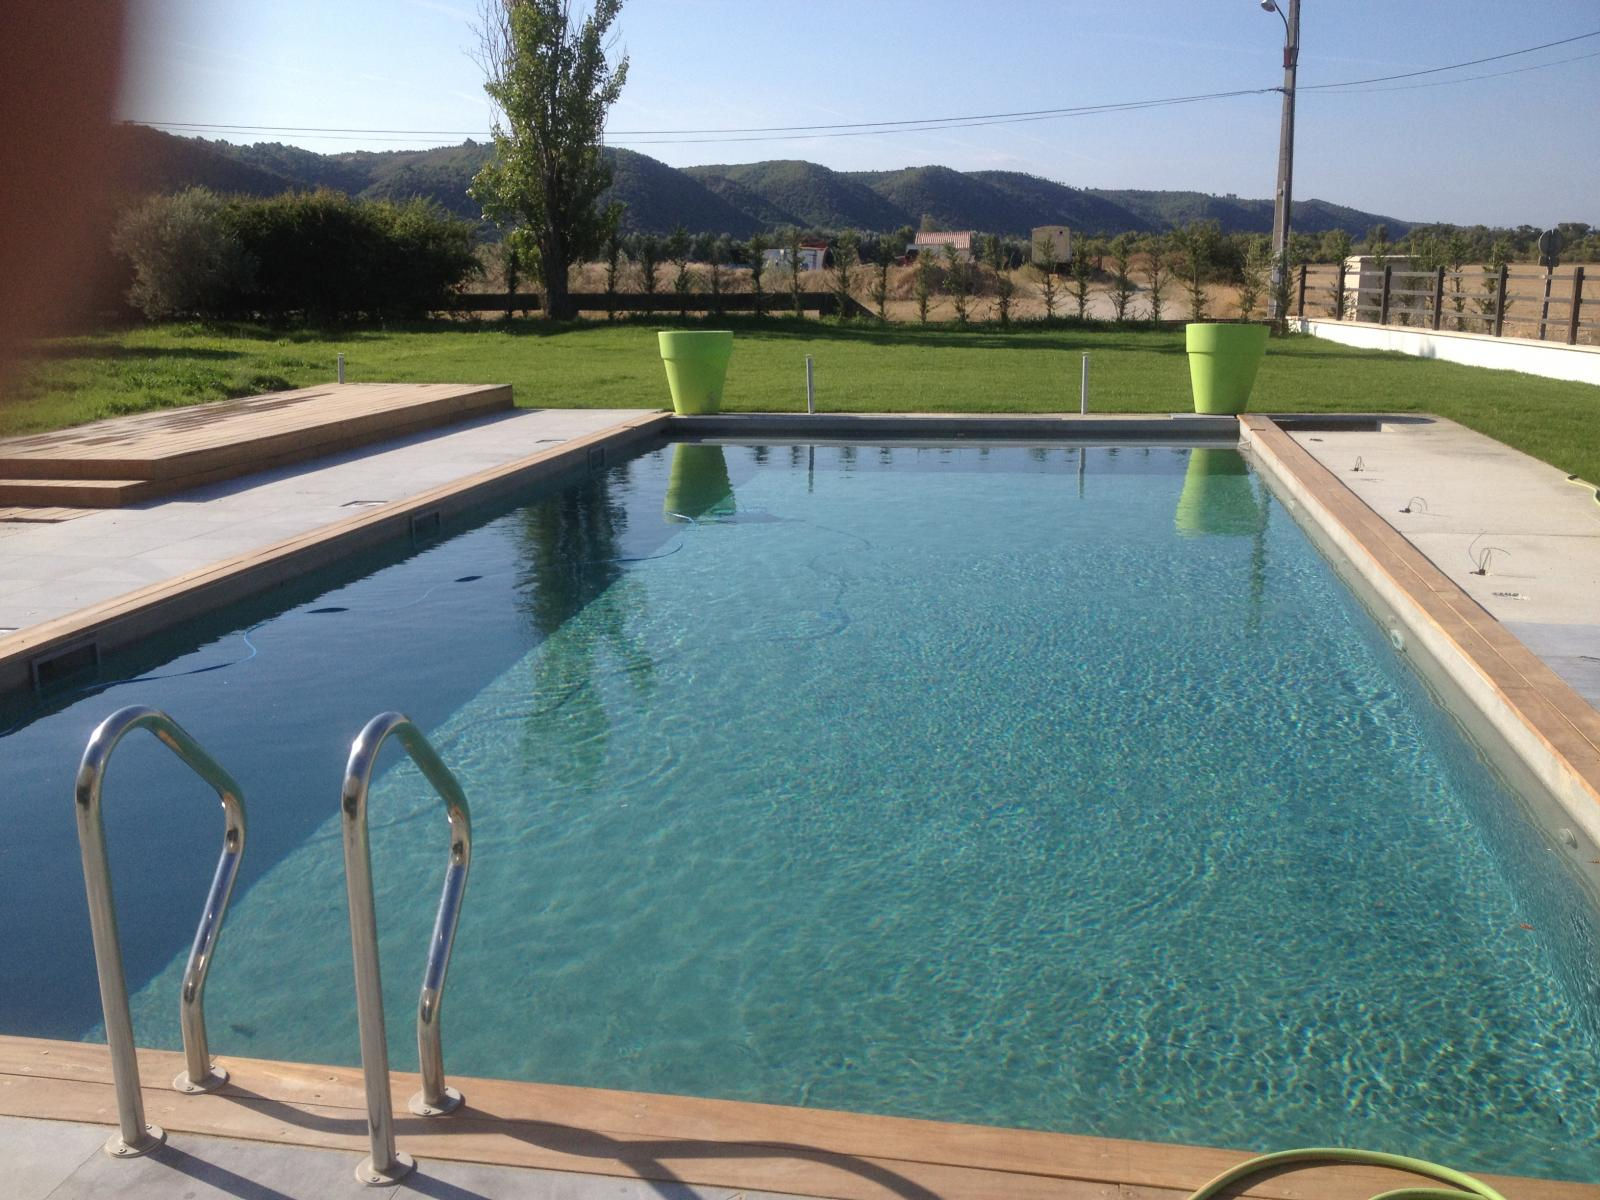 Aquapro : Installation Et Matériel De Piscine Manosque 04100 ... avec Cash Piscine Manosque